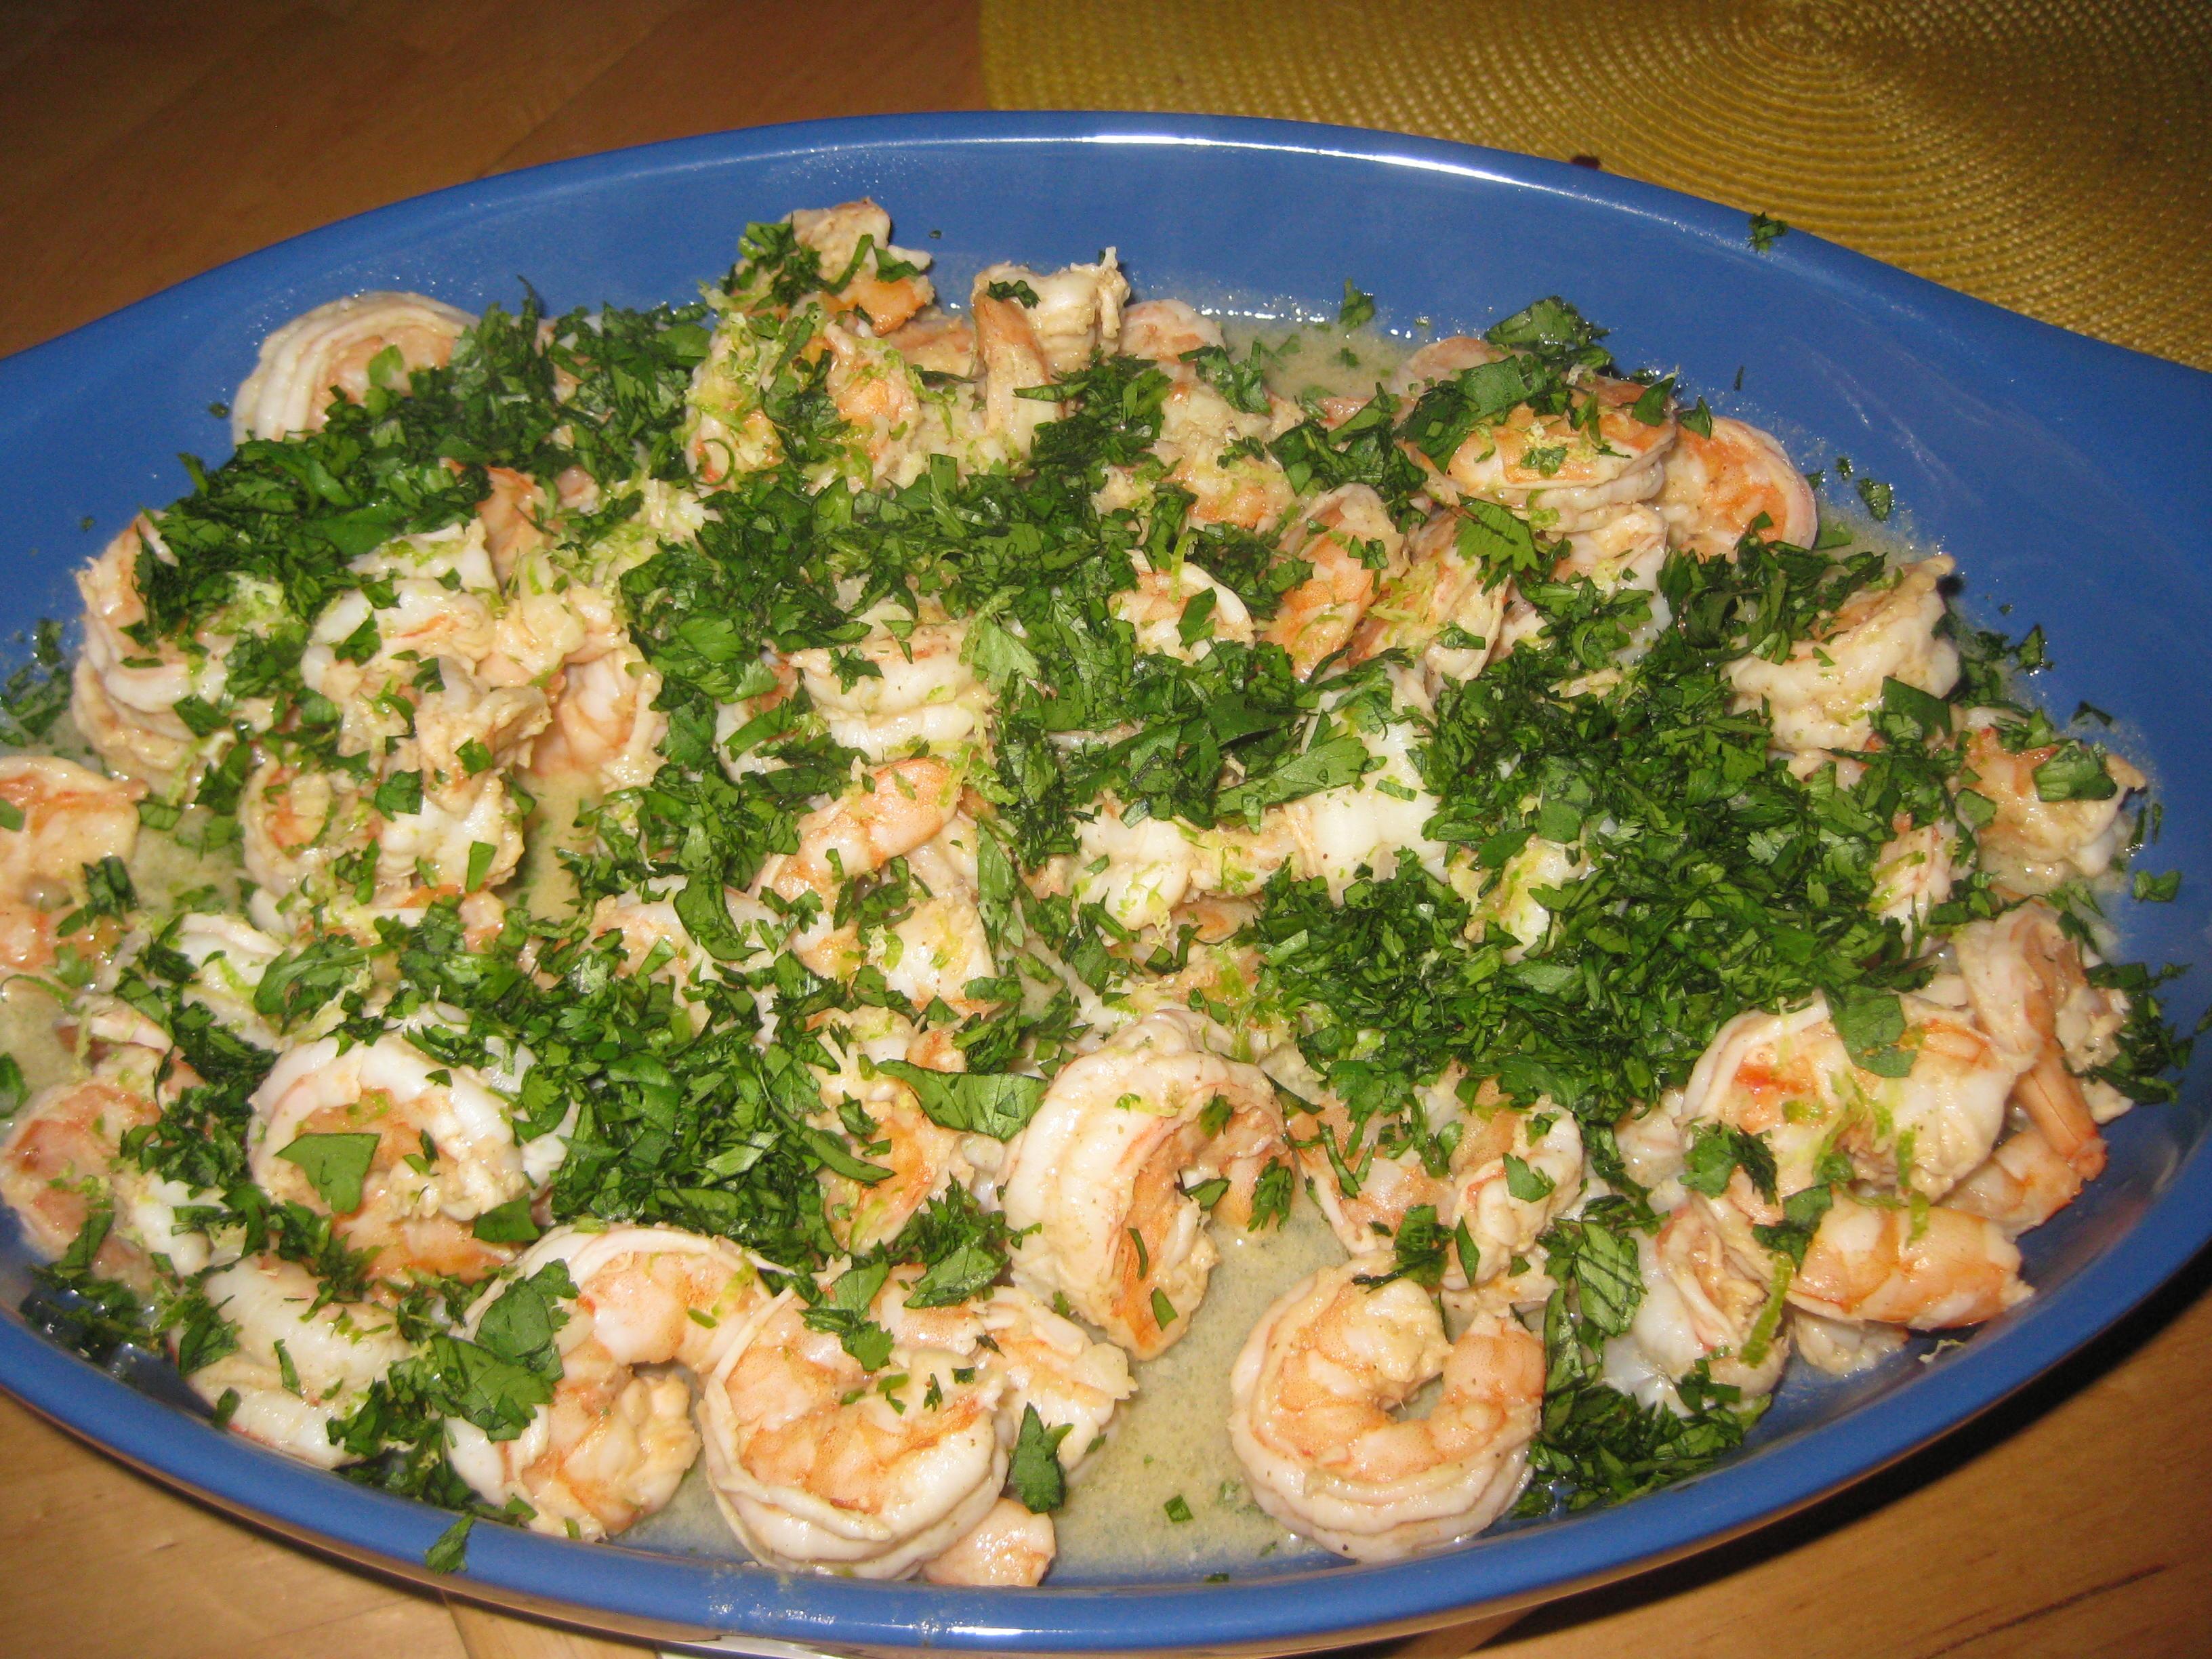 Recipes Course Main Dish Fish and Shellfish Cilantro Lime Shrimp